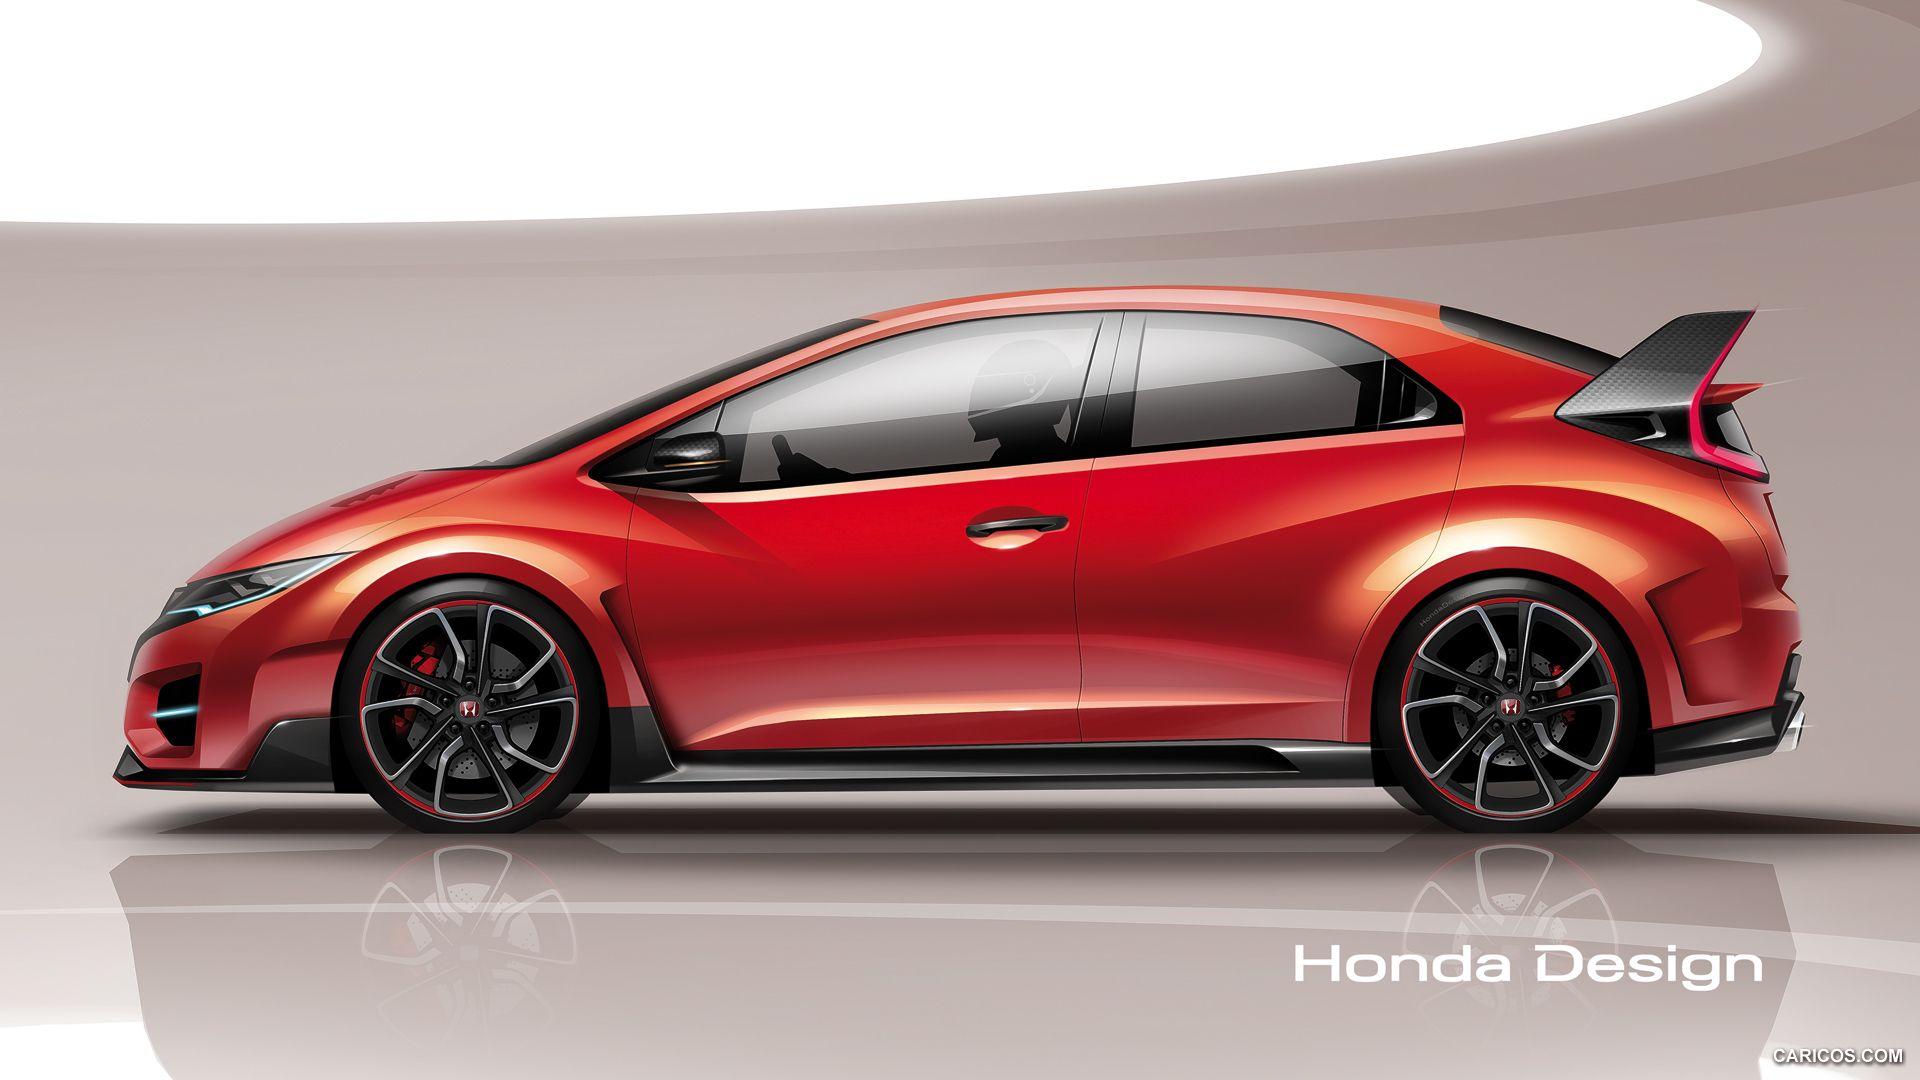 2014 Honda Civic Type R Concept Honda Civic Type R Honda Civic Honda Civic 2014